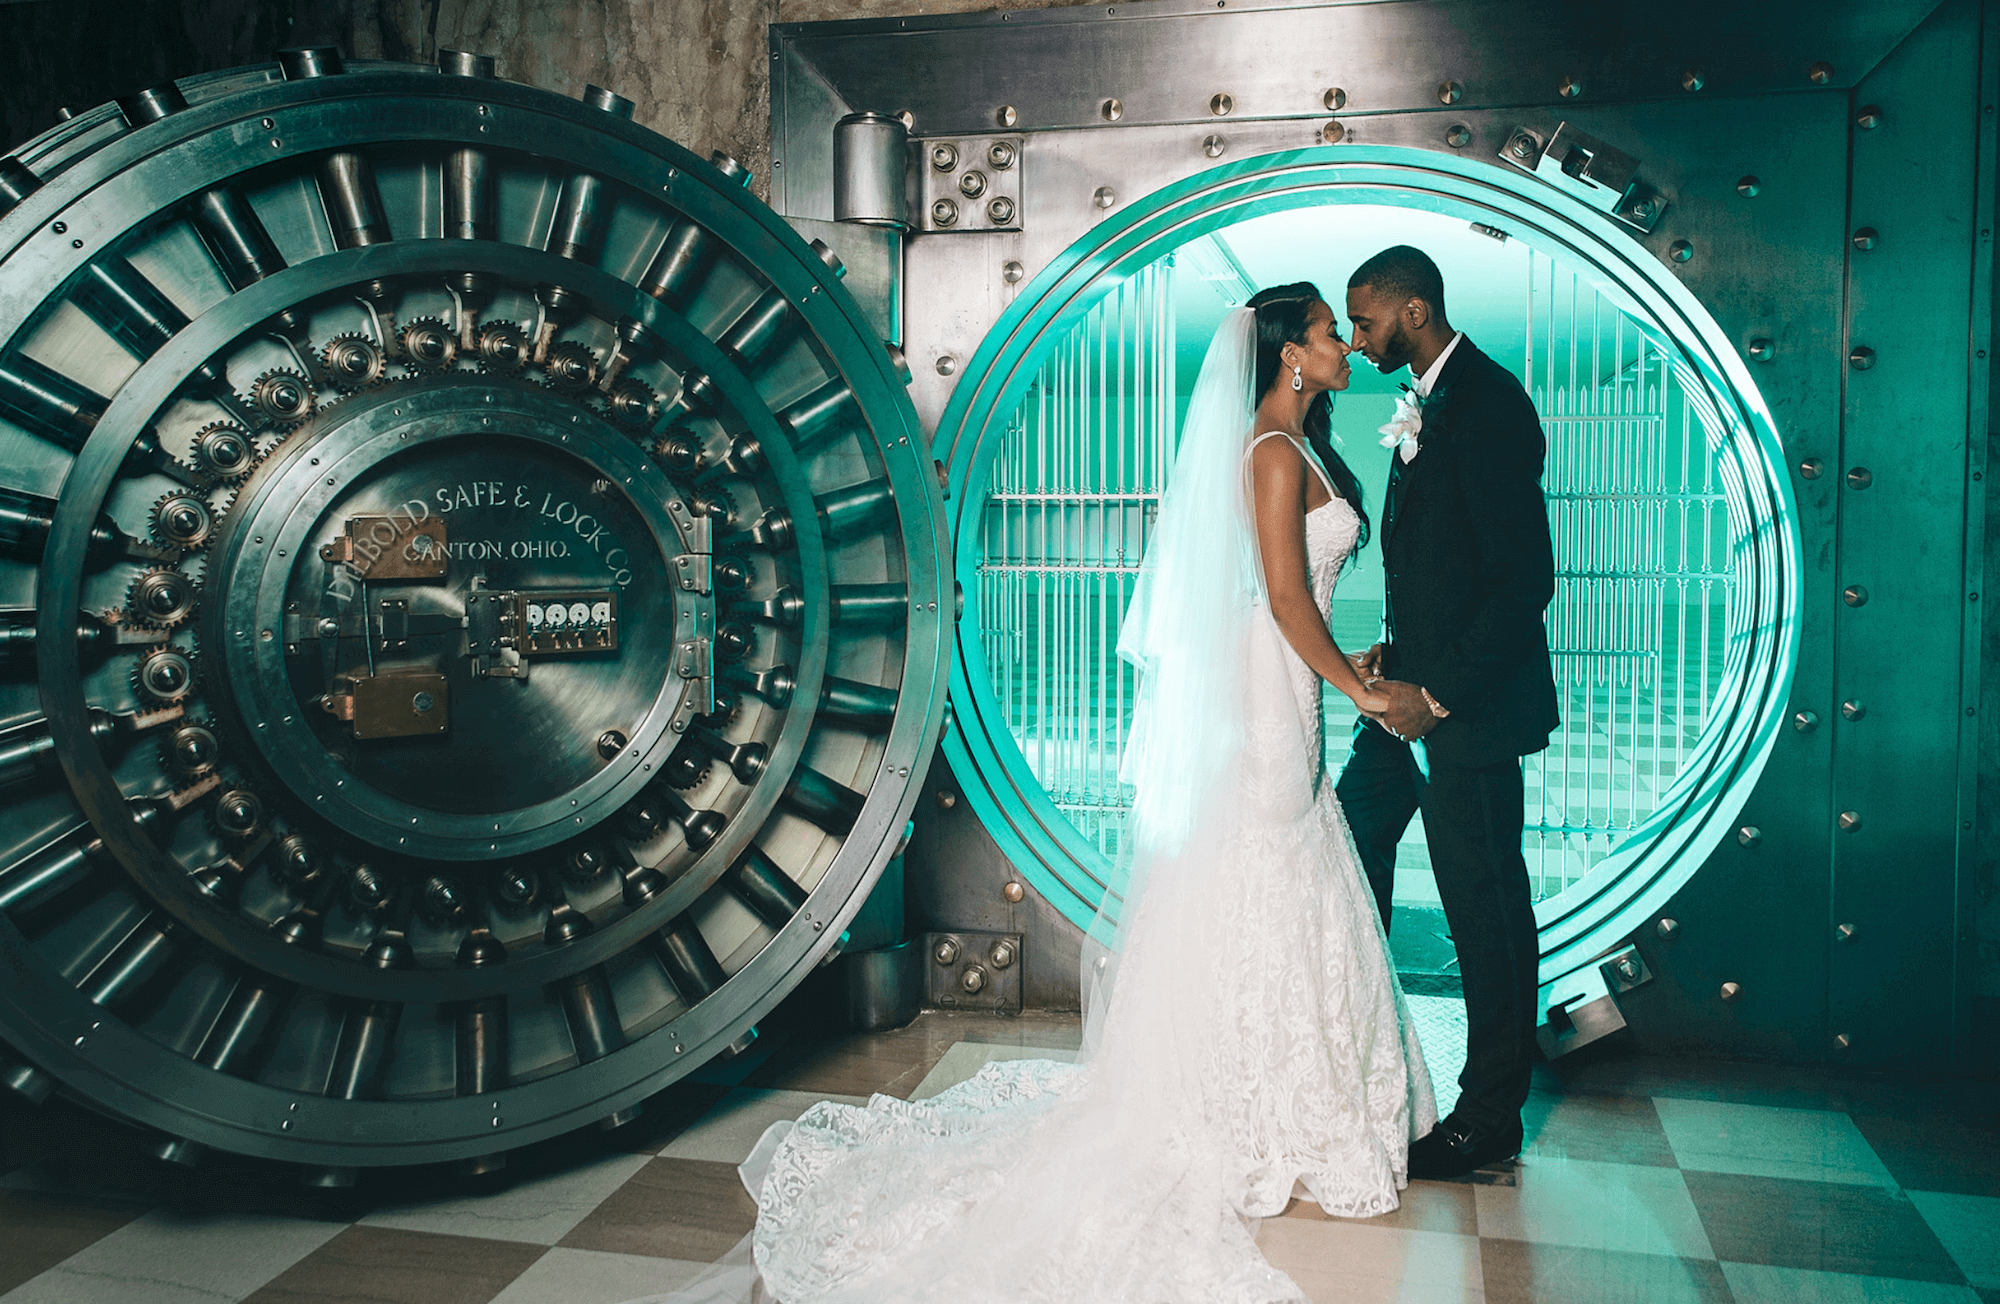 desti-guide-to-destination-weddings-podcast-008-bahamas-destination-wedding-photographer-black-destination-bride-stanlo-photography-interview-4.png